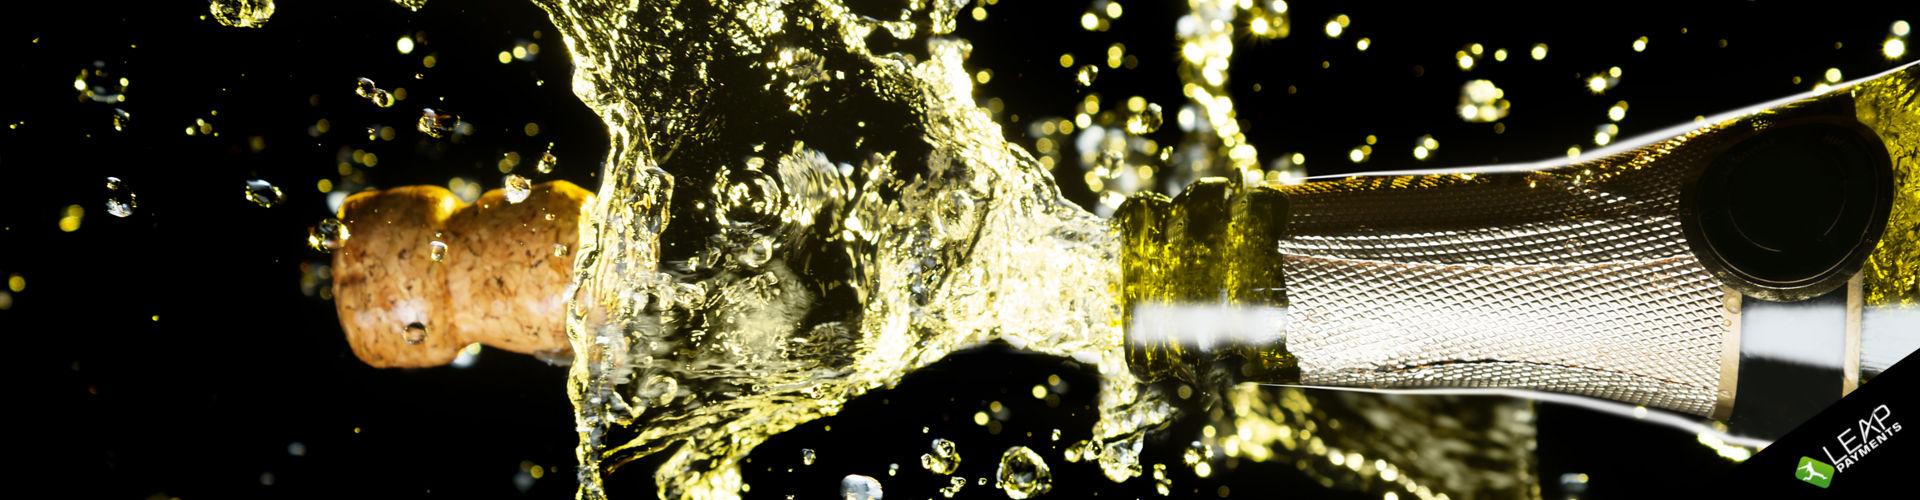 champaign online wine merchant account cork pop